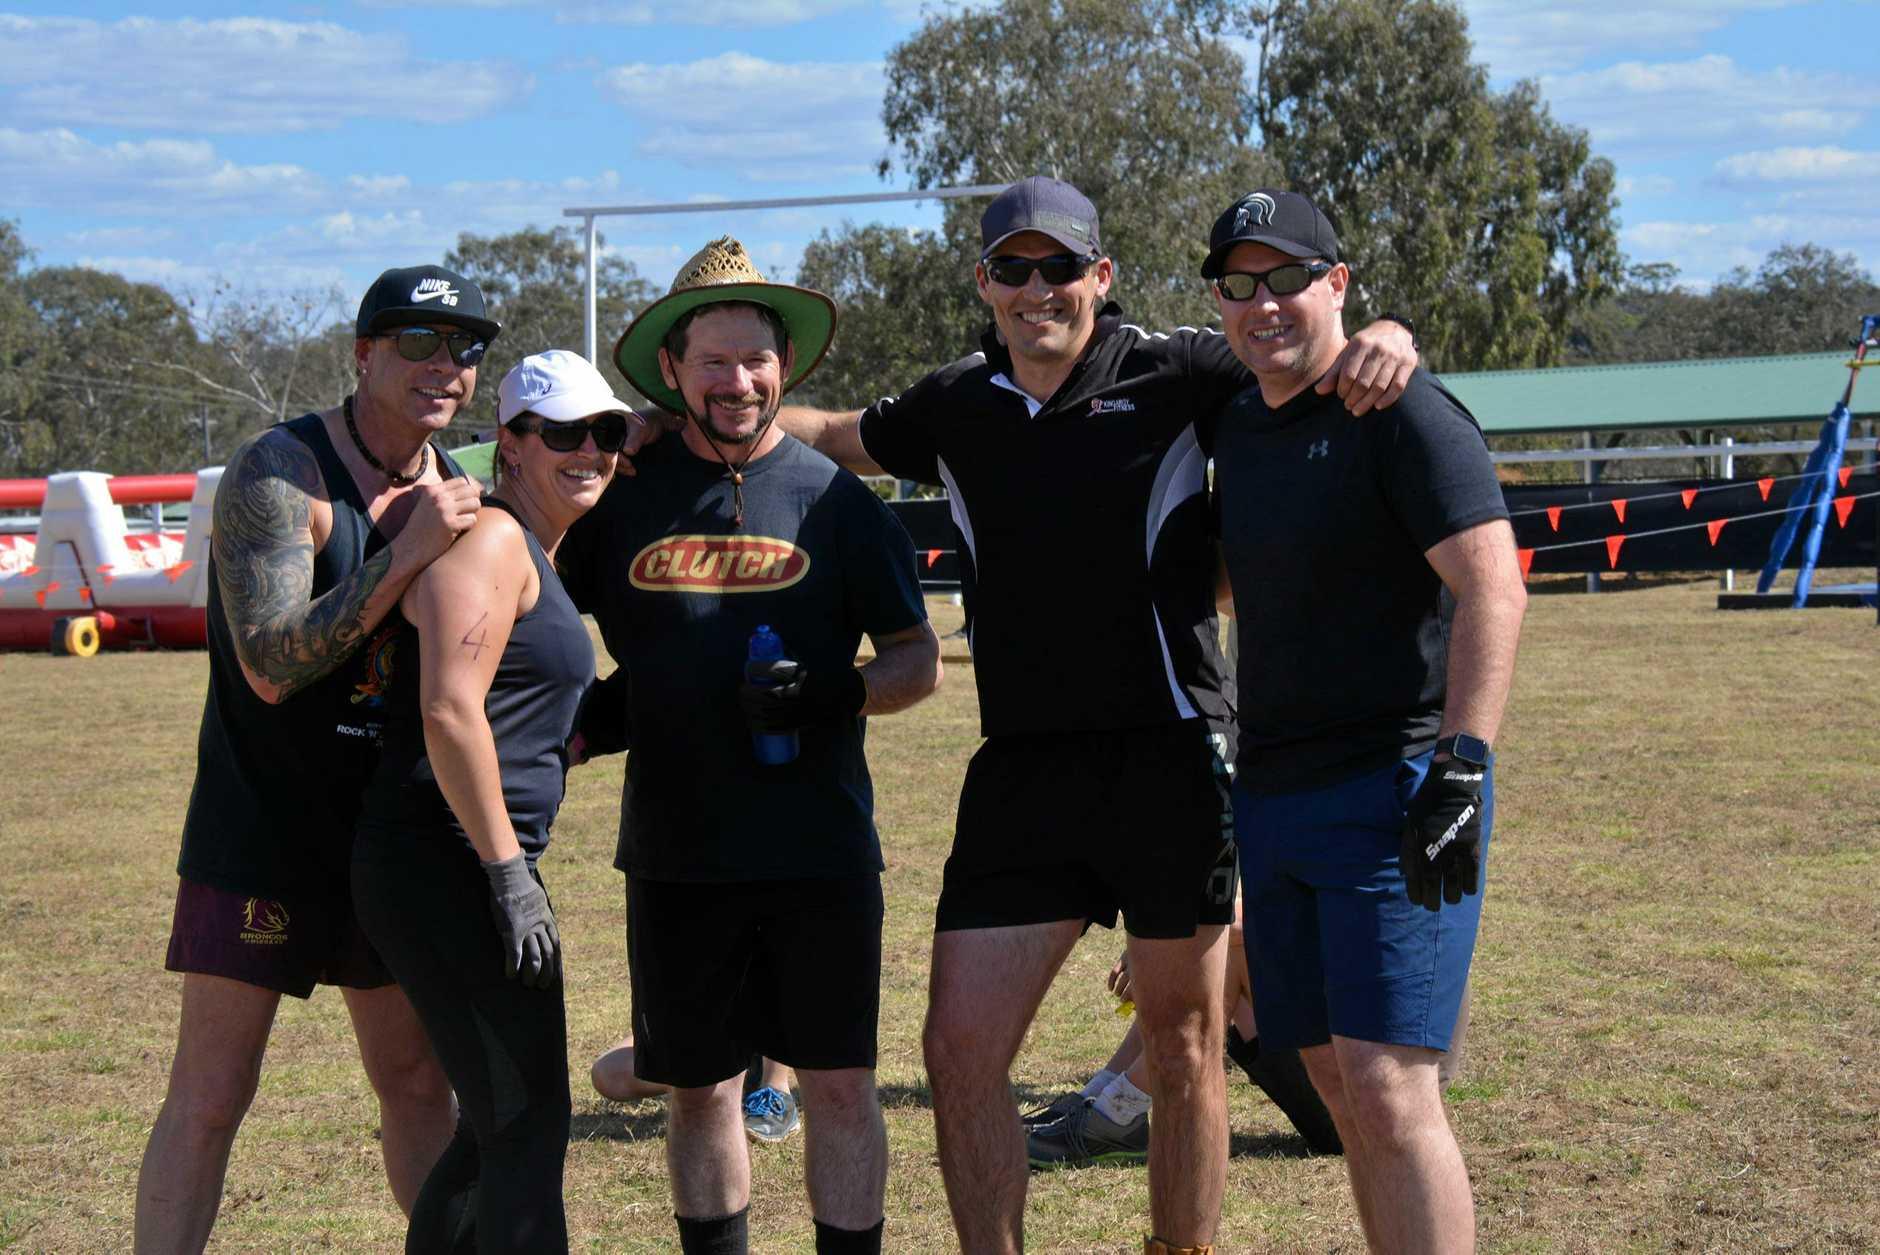 Kingaroy Fitness team: Steven Eckart, Adrian Maybon, Keenan Limb, Chris Arnold, and Emma Corrigan.